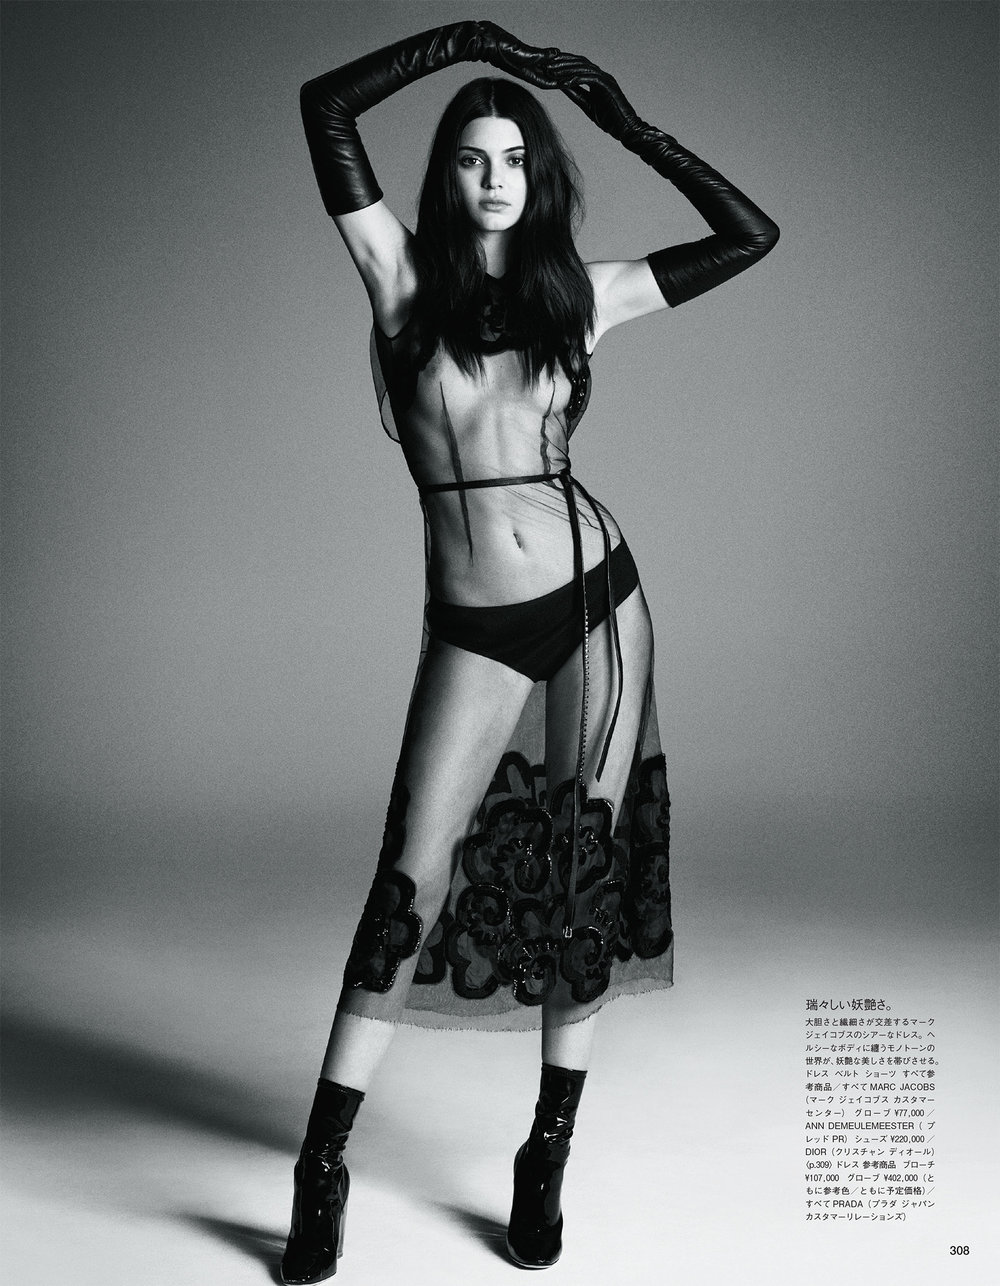 Giovanna-Battaglia-Vogue-Japan-November-2015-Cool-As-Kendall-Patrick-Demarchelier-Kendall-Jenner-4.jpg